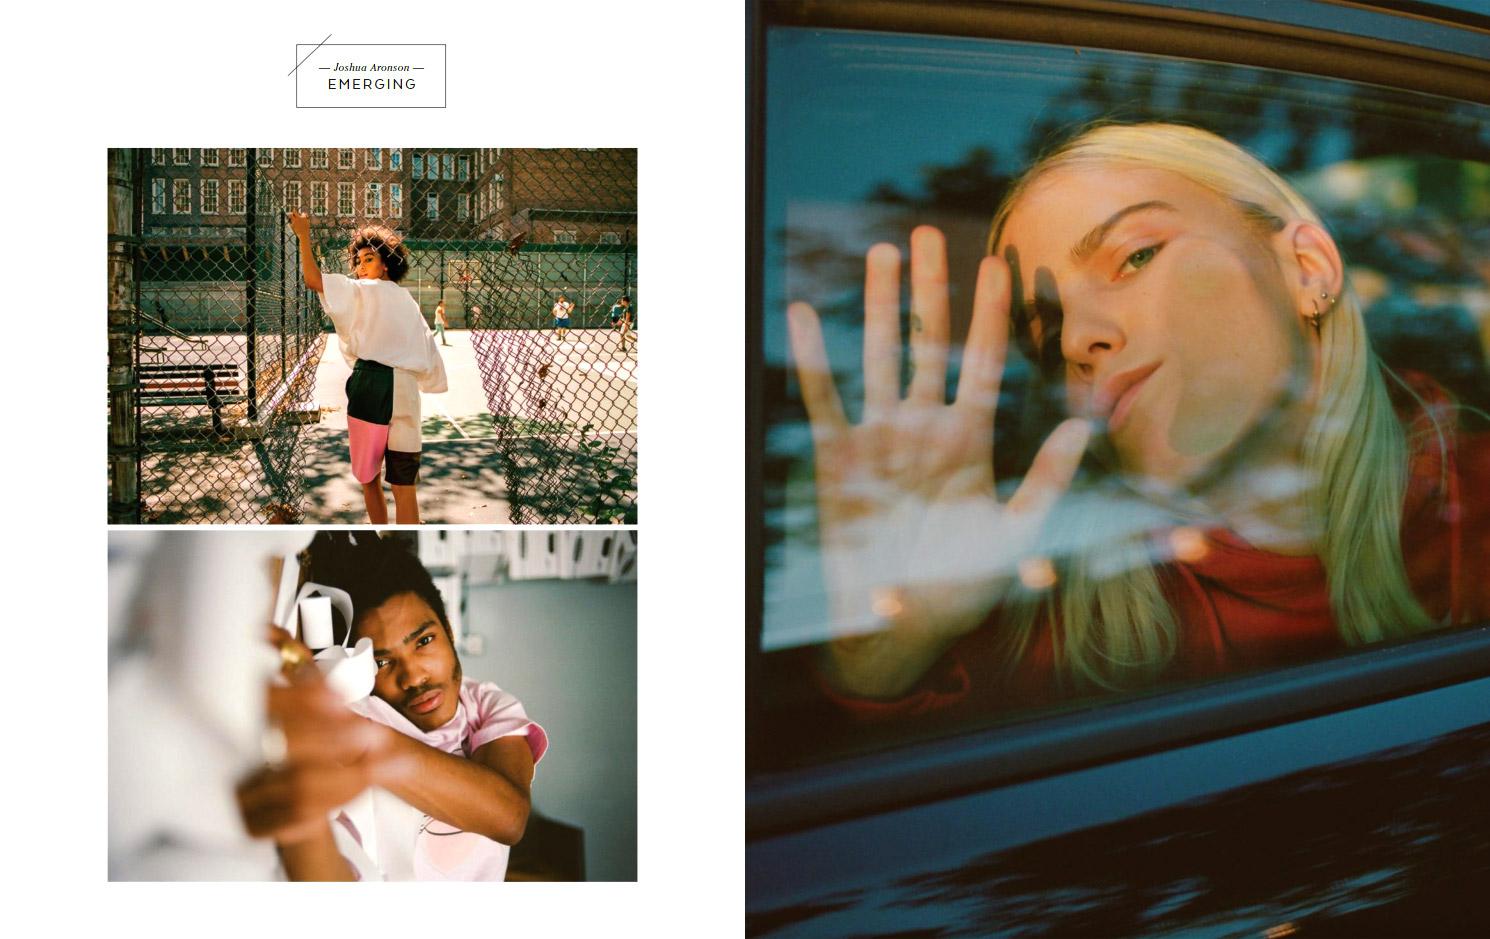 Emerging, © Joshua Aronson, Emerging Photographer